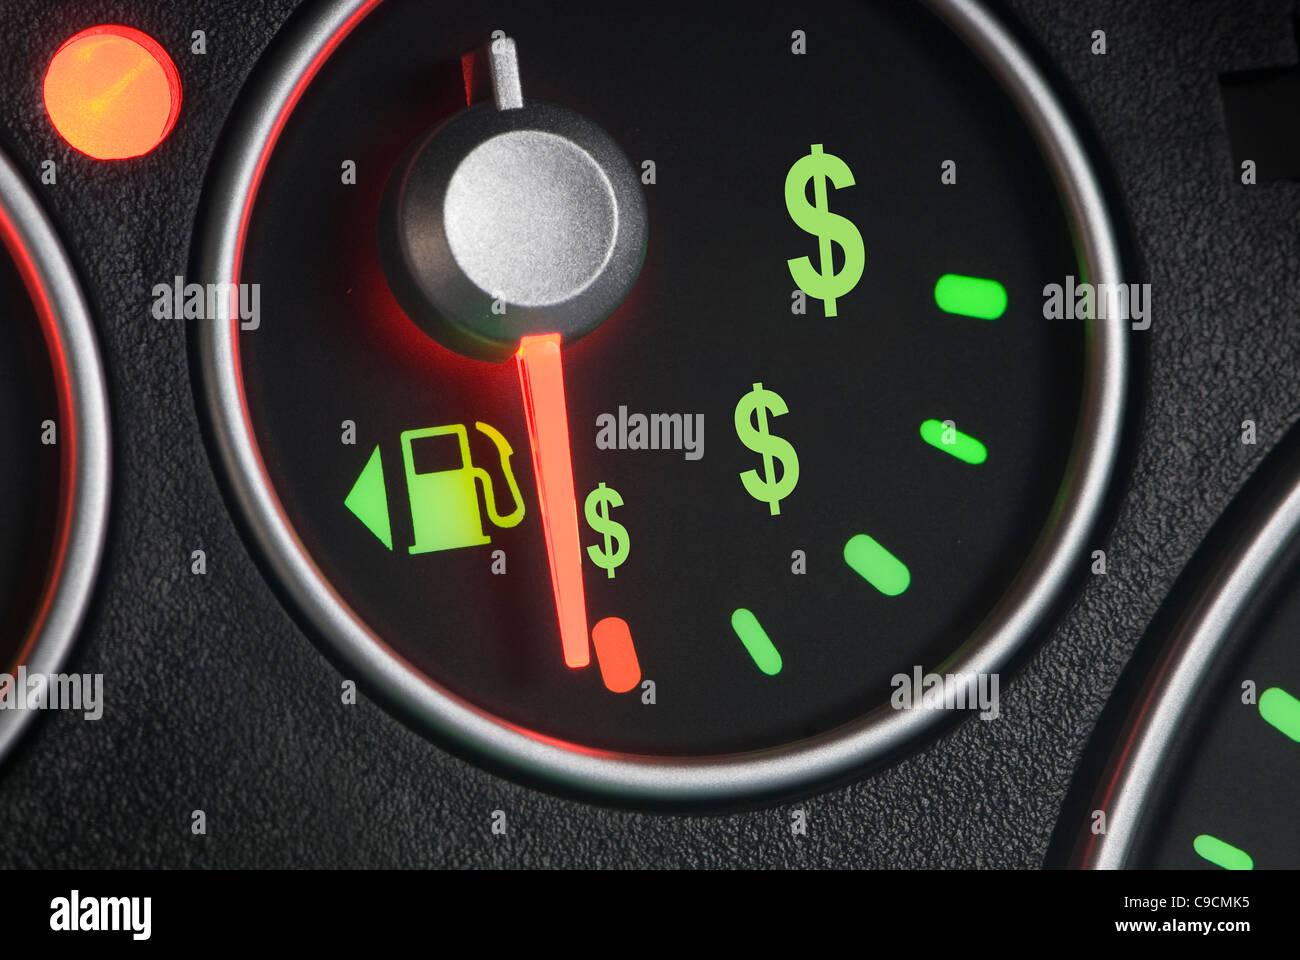 Fuel guage on empty with currency symbols stock photo royalty fuel guage on empty with currency symbols buycottarizona